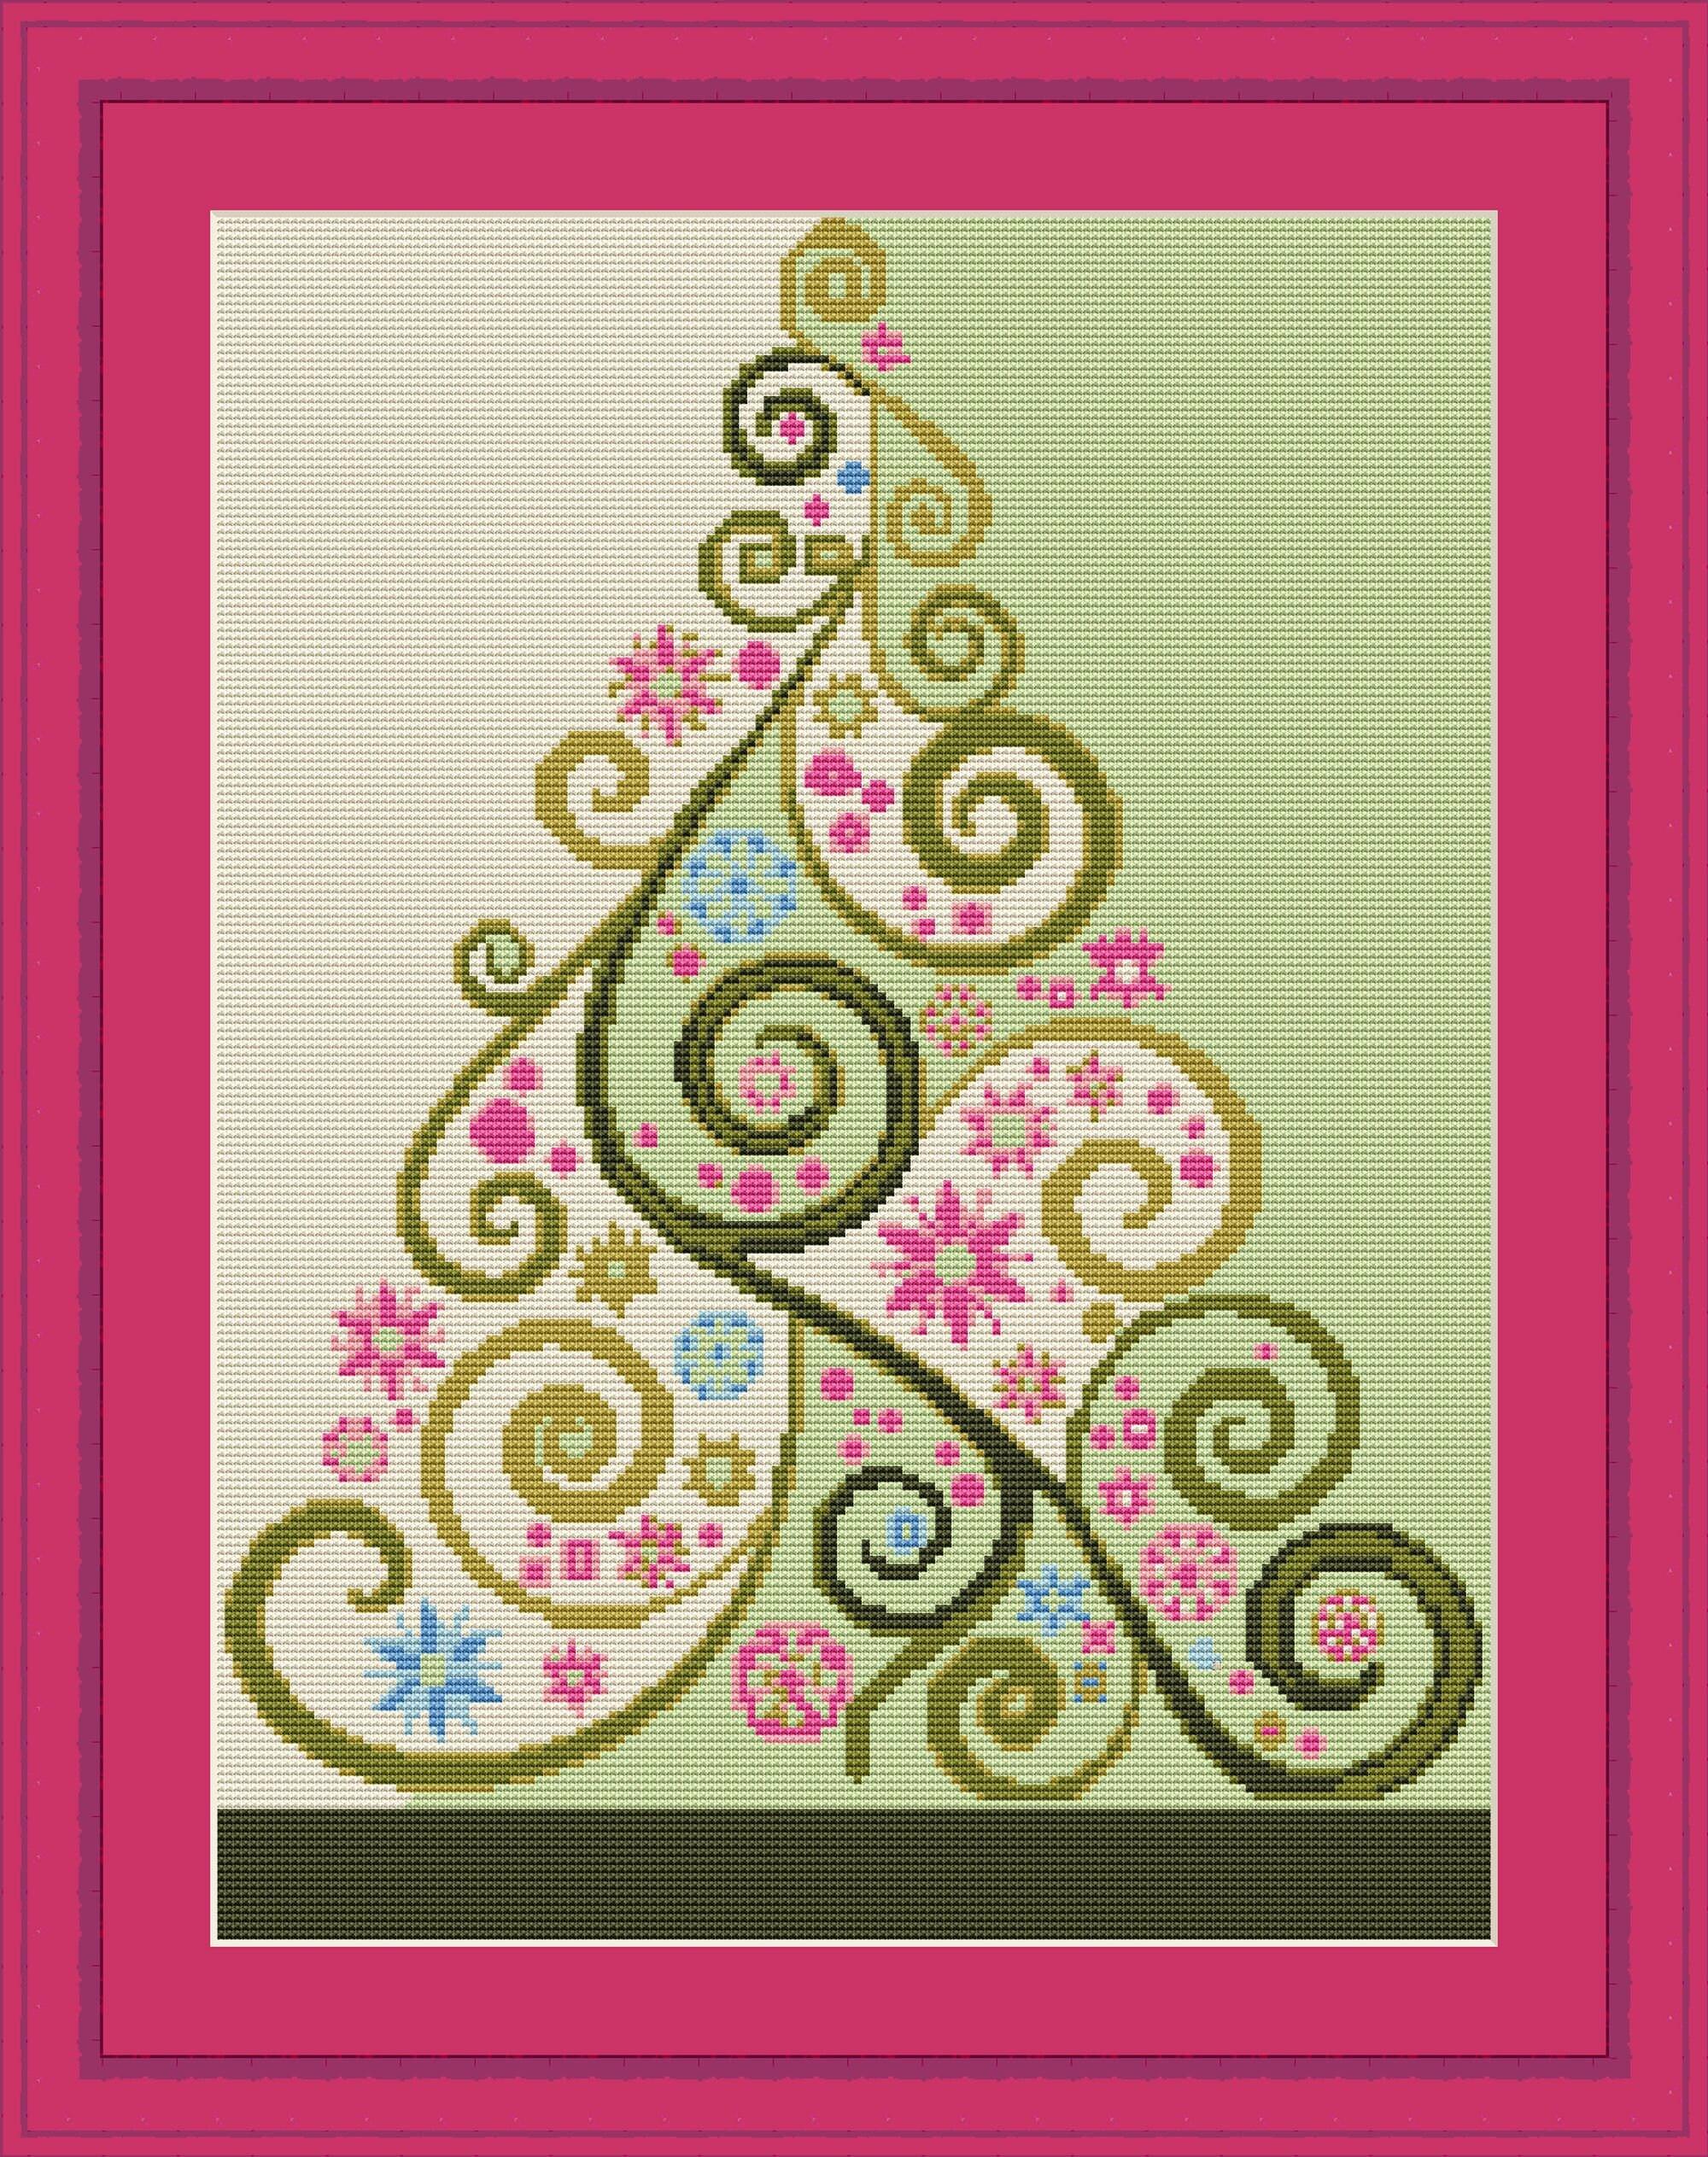 christmas tree cross stitch pattern easy pdf down load  etsy